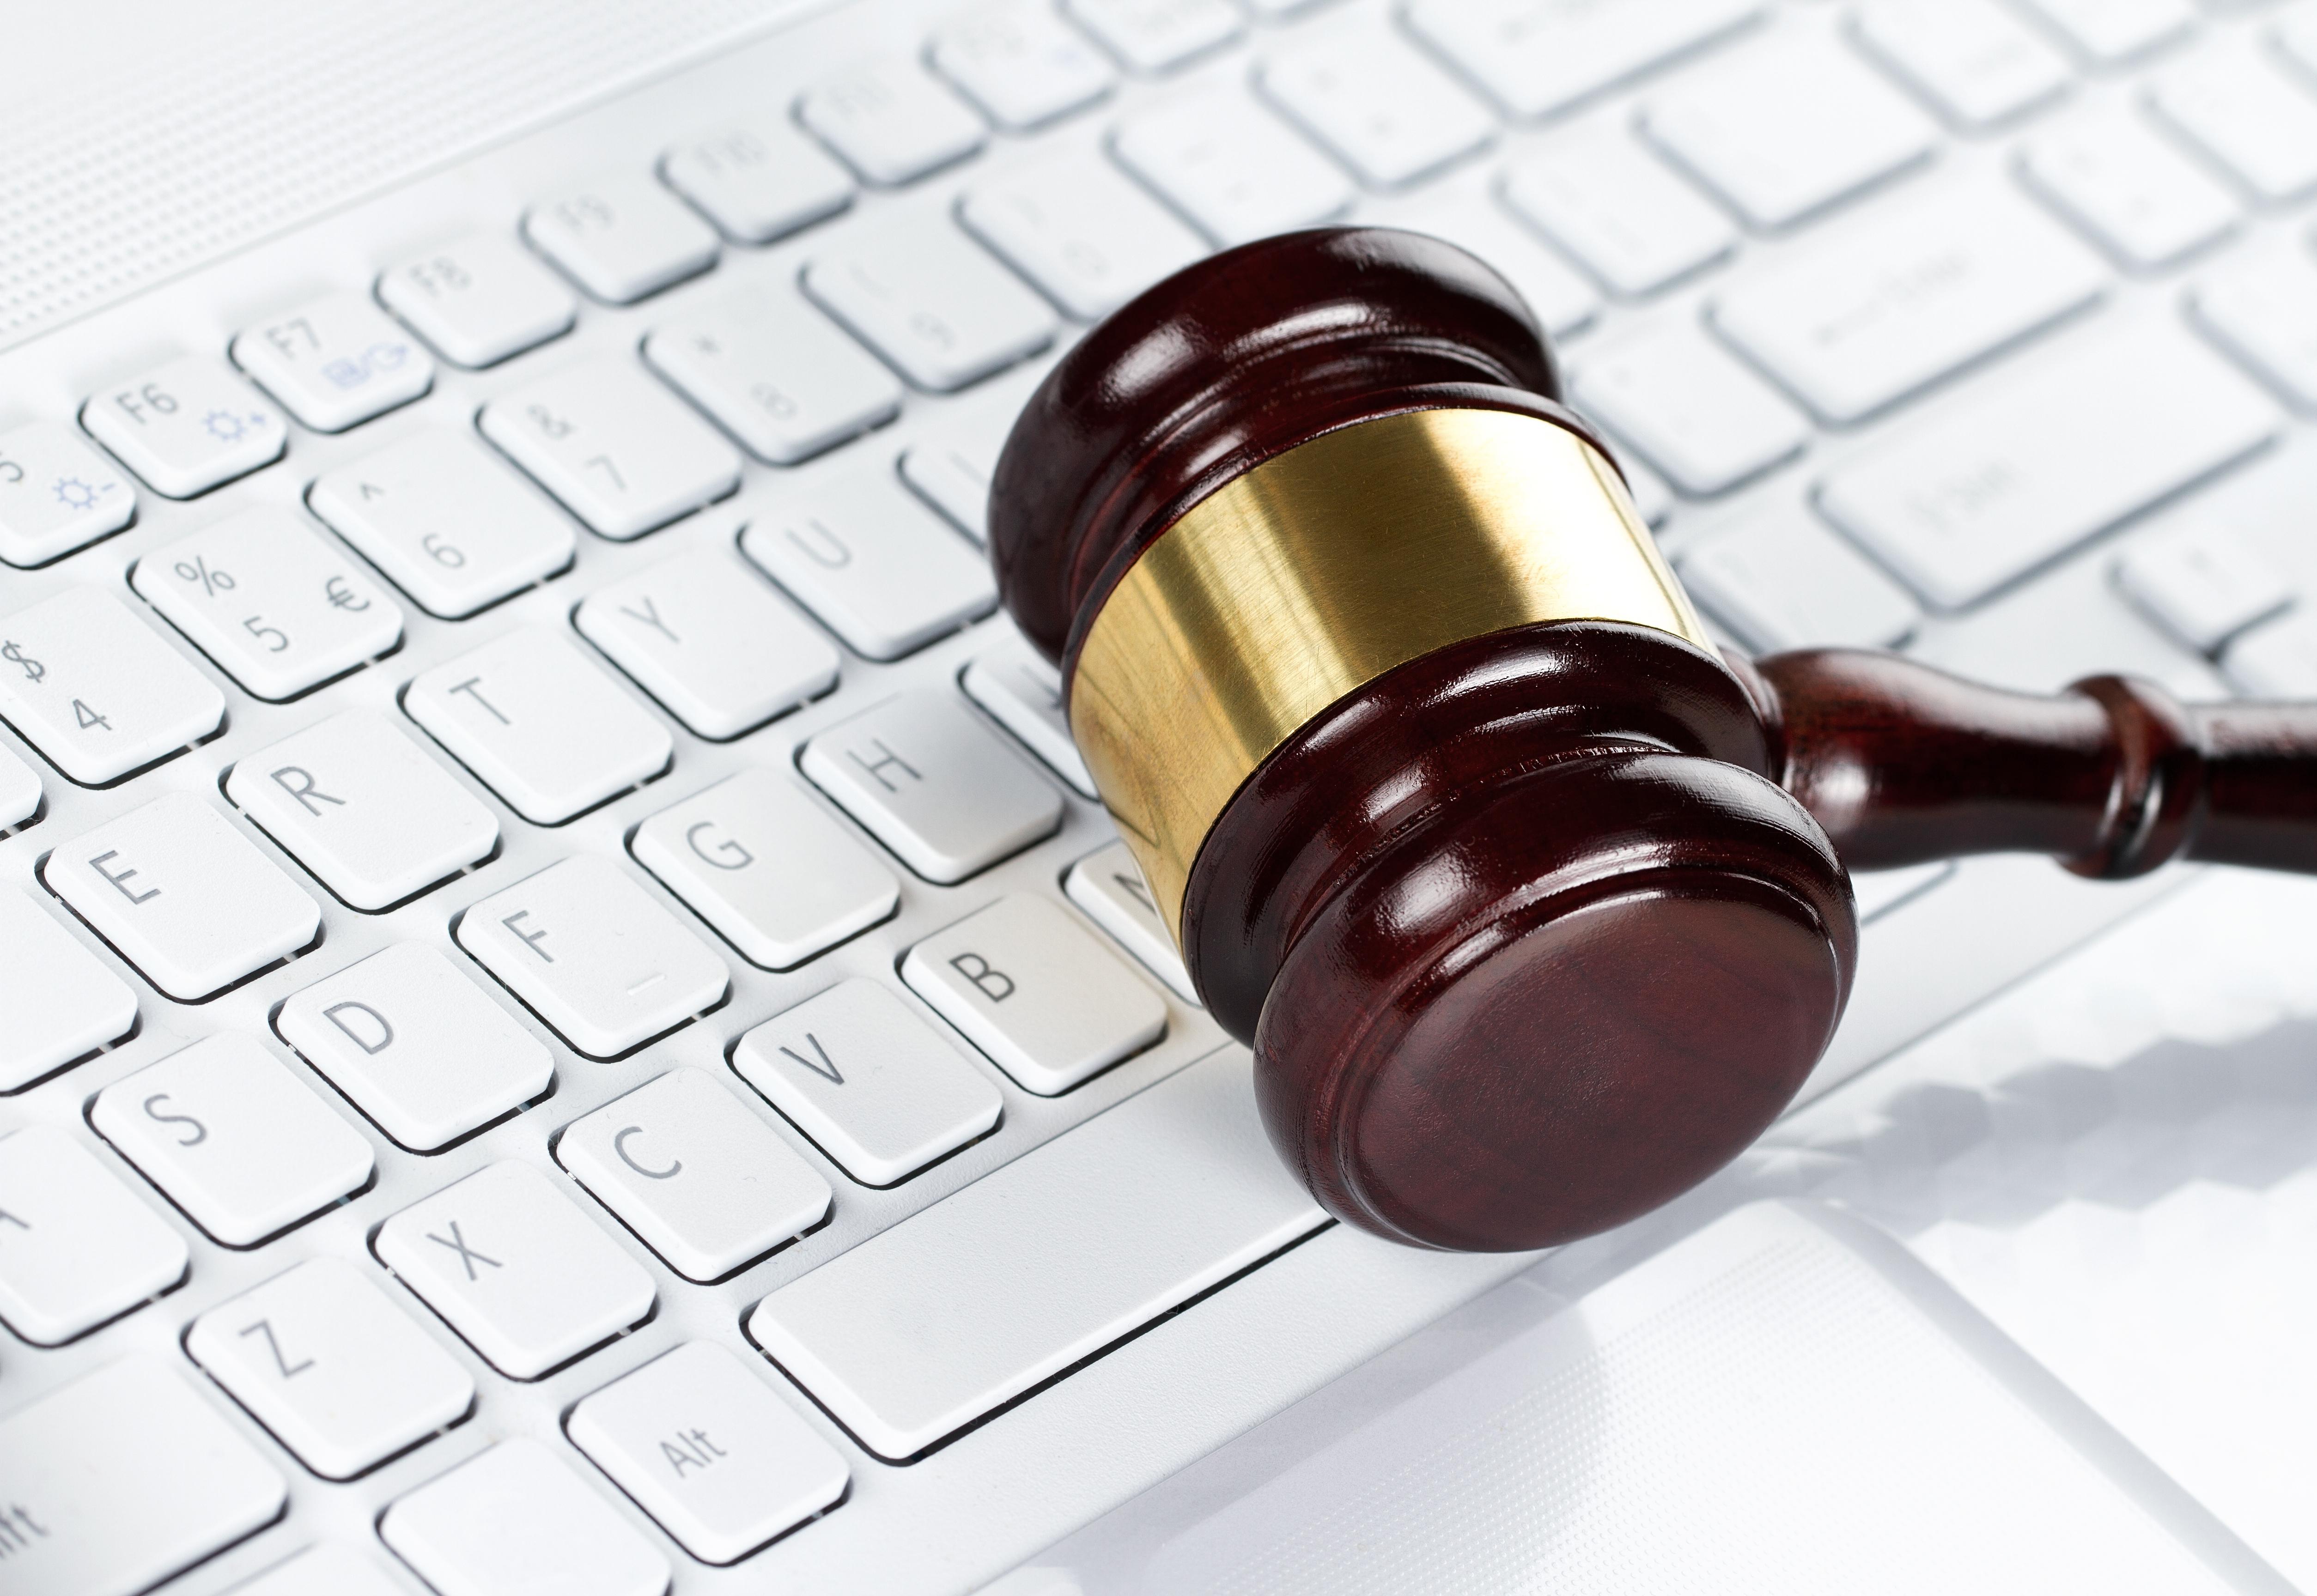 http://mygazeta.com/i/2014/12/internet-zakon.jpg